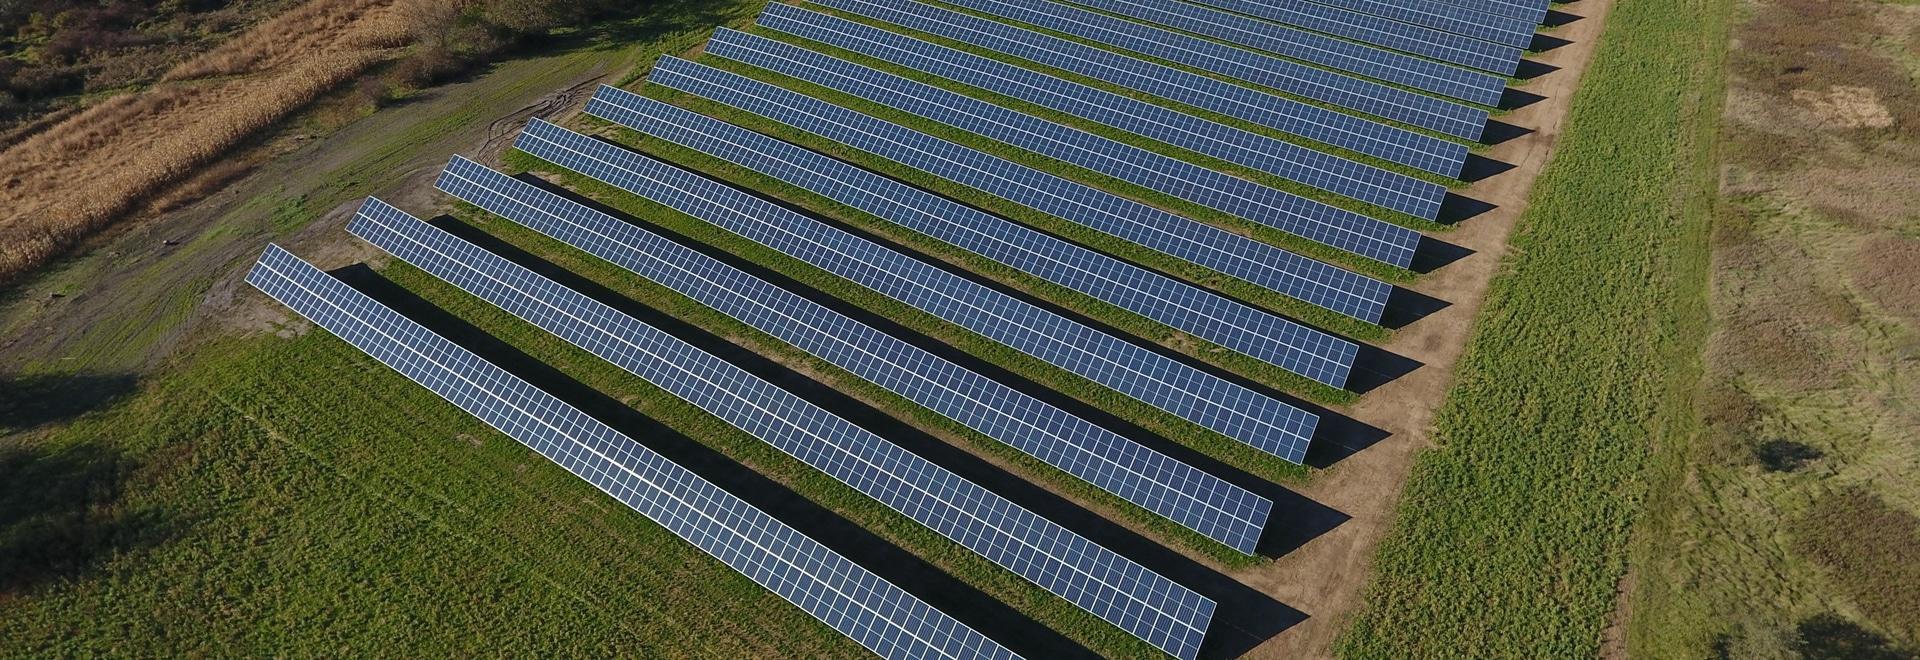 Solarinstallationserfolg in Michigan